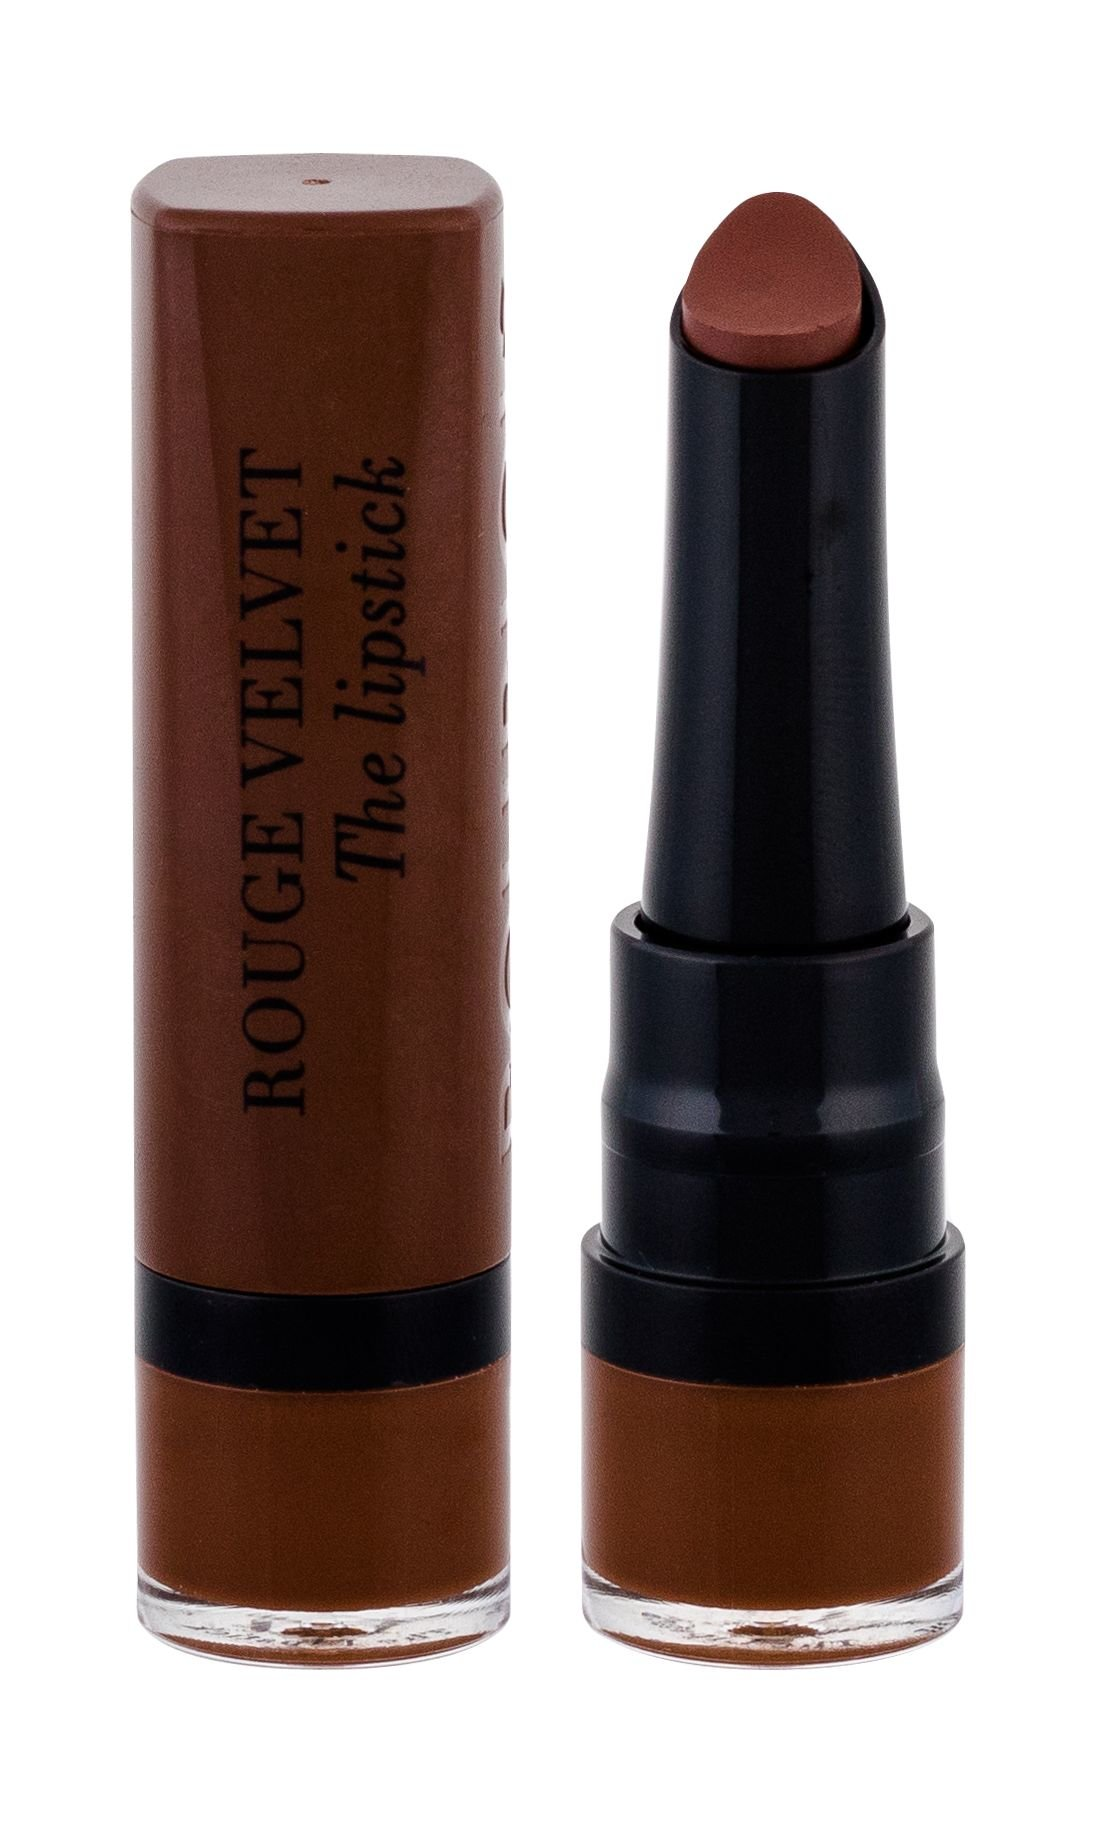 BOURJOIS Paris Rouge Velvet Lipstick 2,4ml 14 Brownette